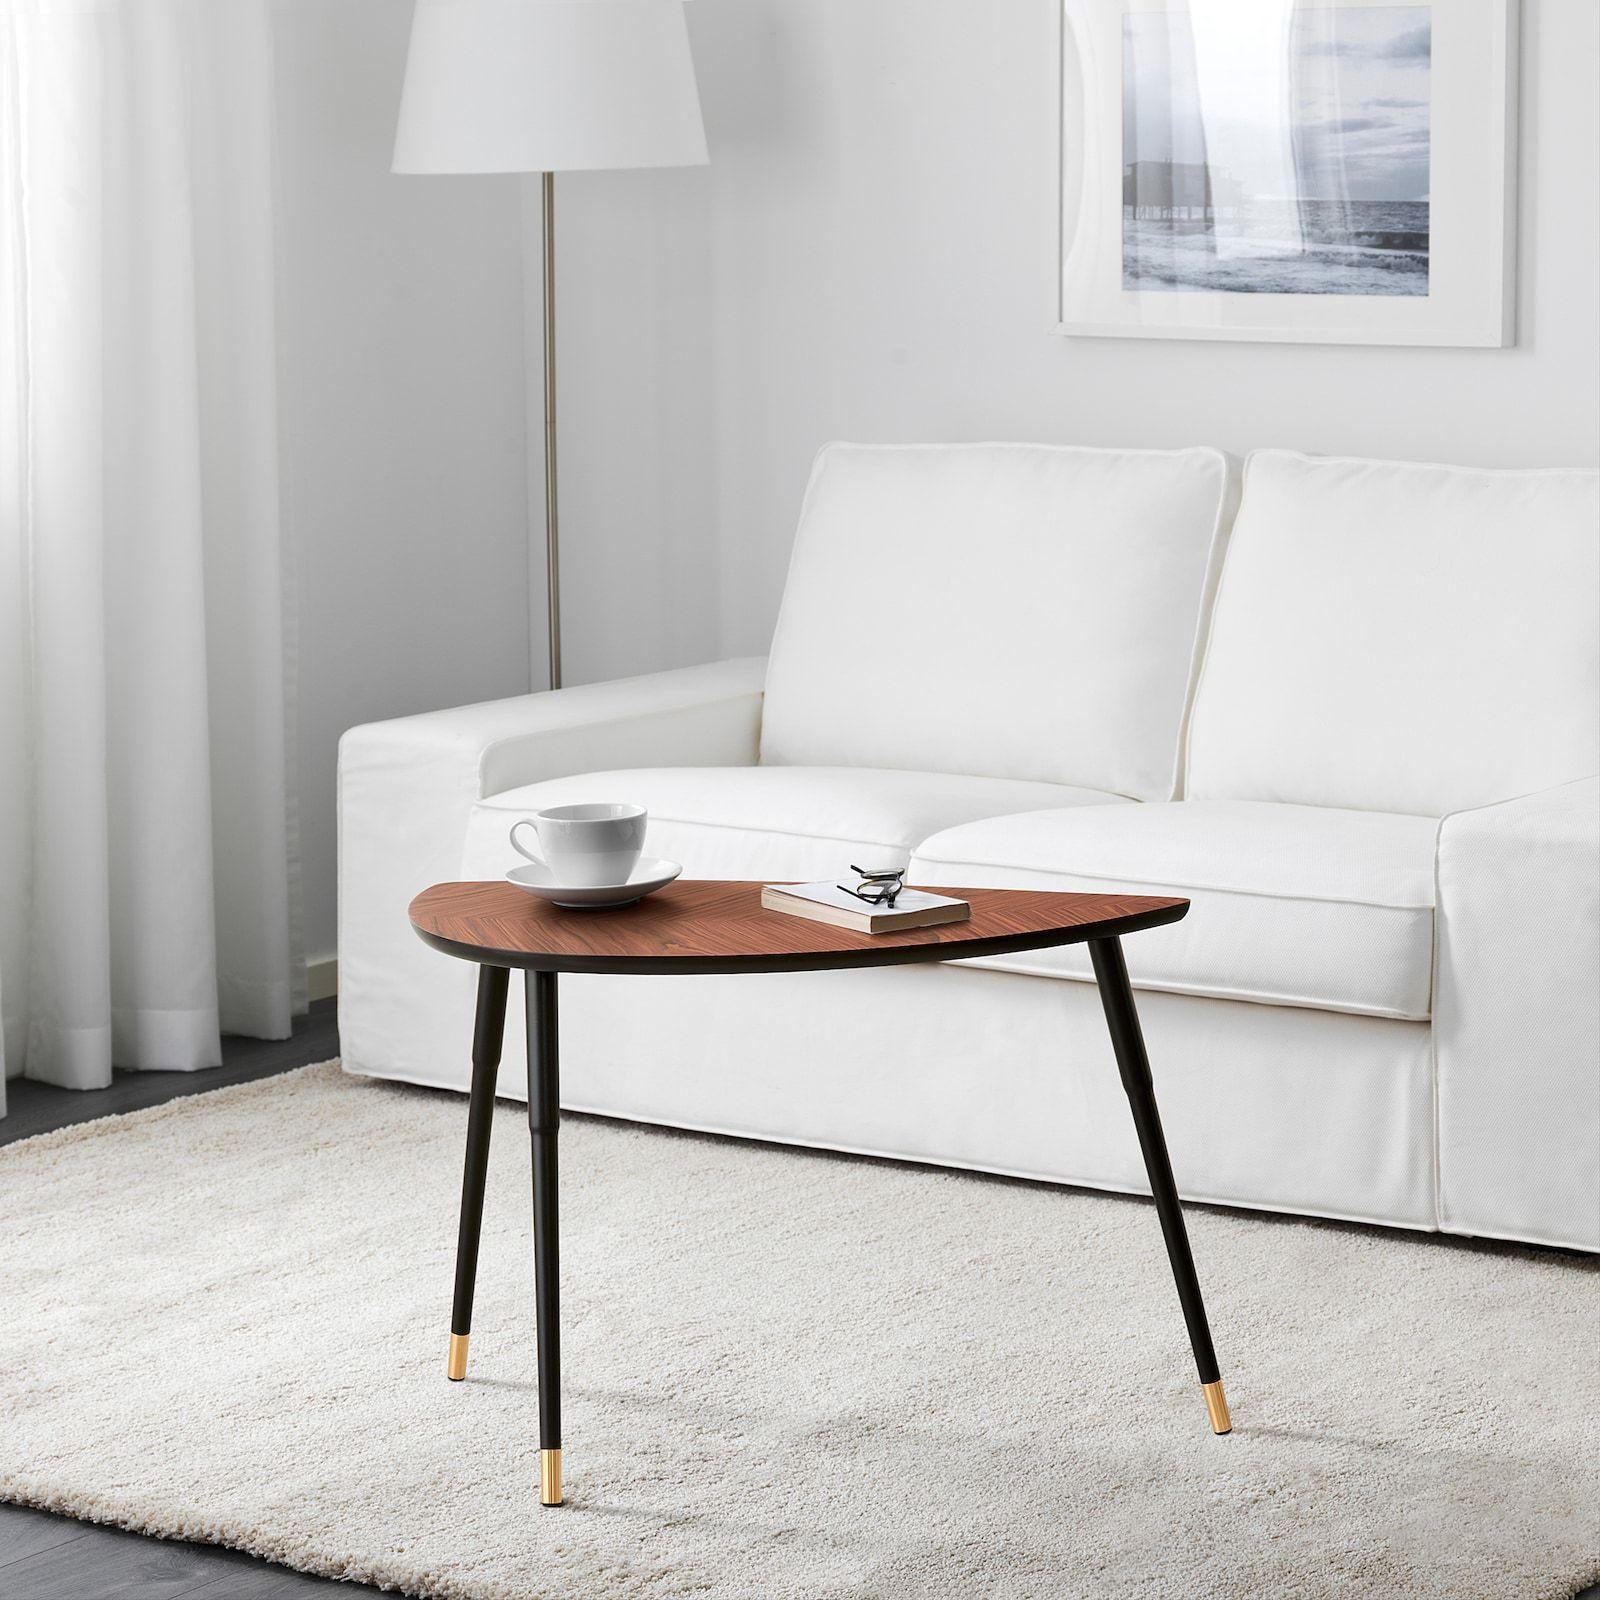 Lovbacken Side Table Medium Brown 30 3 8x15 3 8 Ikea Coffee Table Side Table Retro Side Table [ 1600 x 1600 Pixel ]